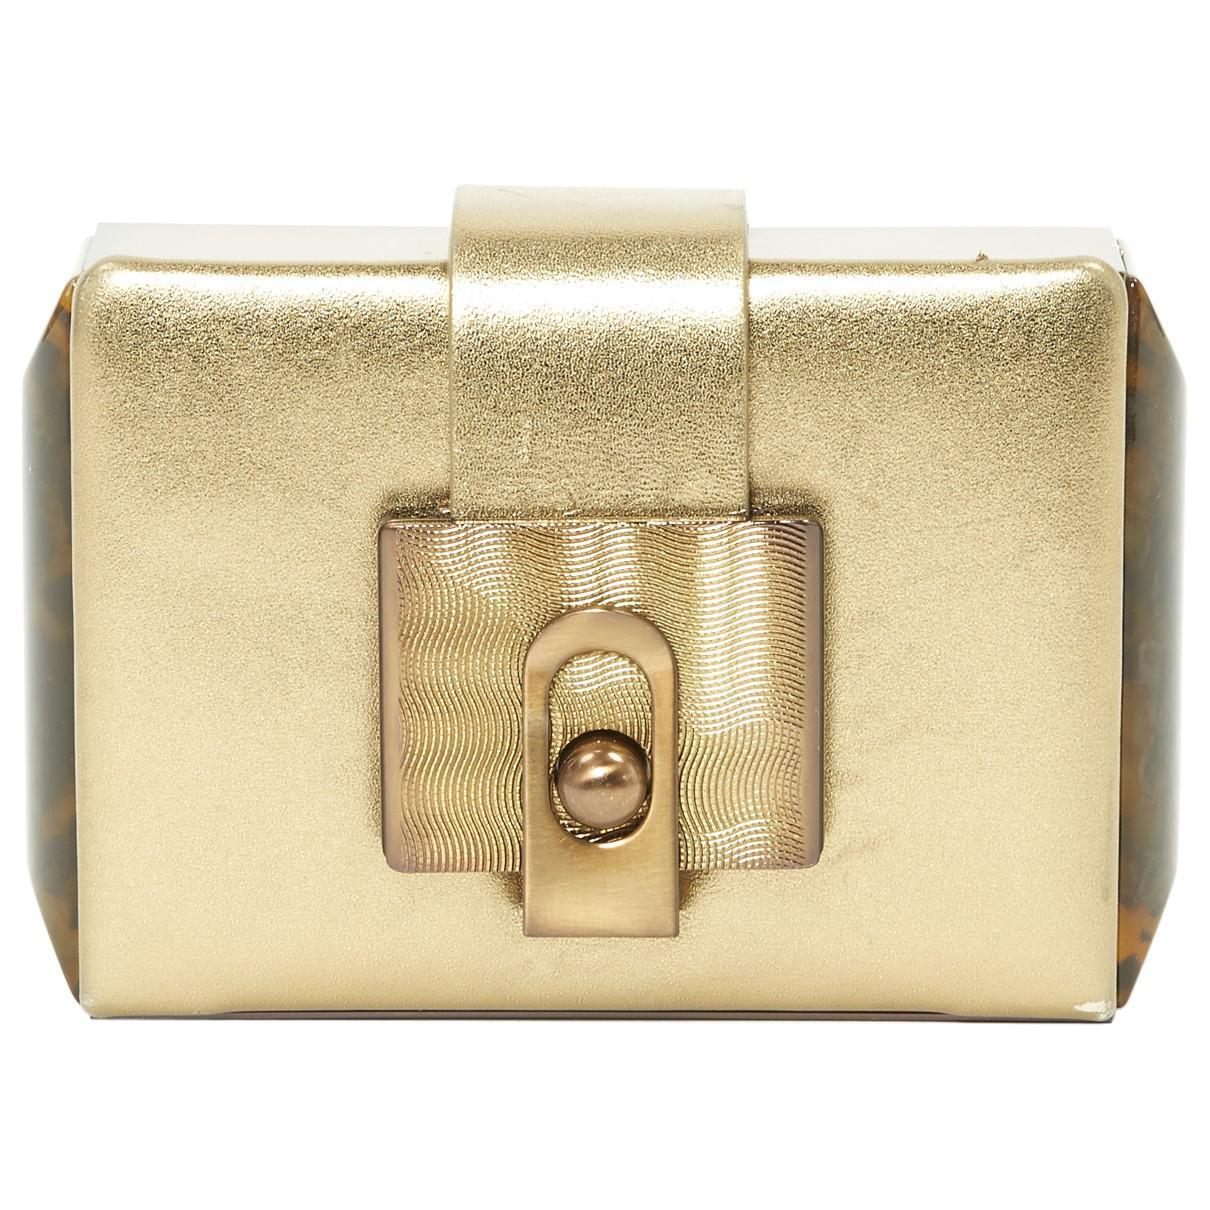 Lanvin Pre-owned - Leather clutch bag rHBToL